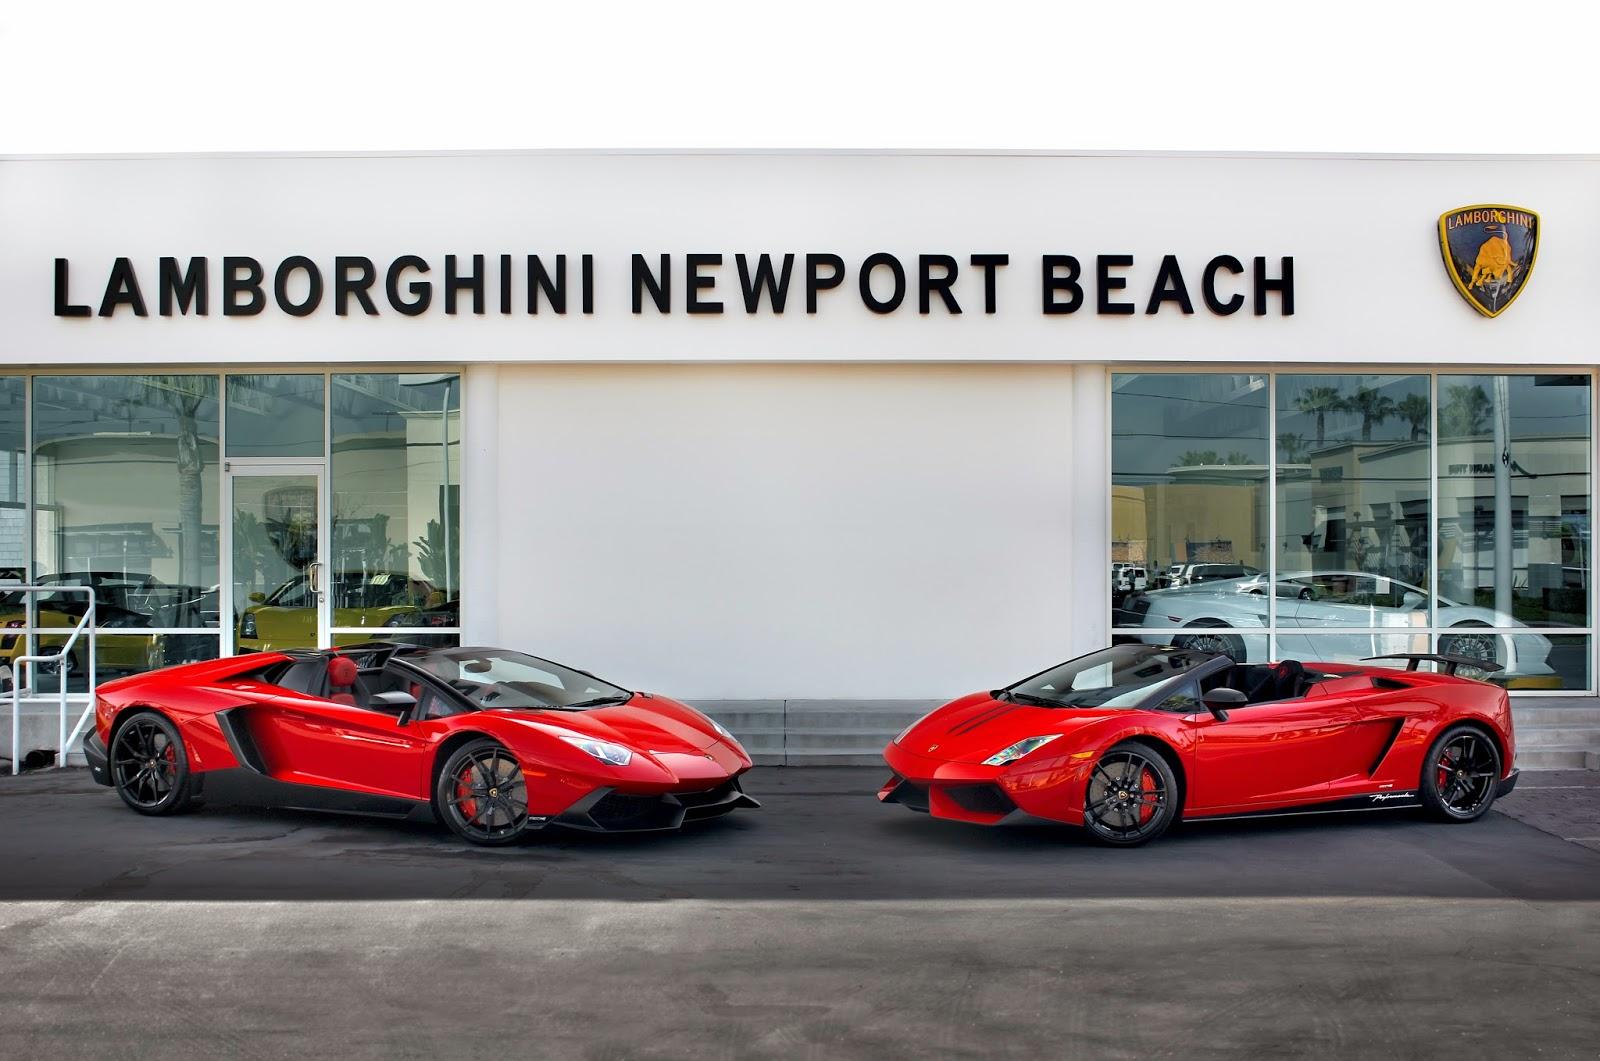 Lamborghini Newport Beach Blog Aventador Lp 720 4 Roadster 50th